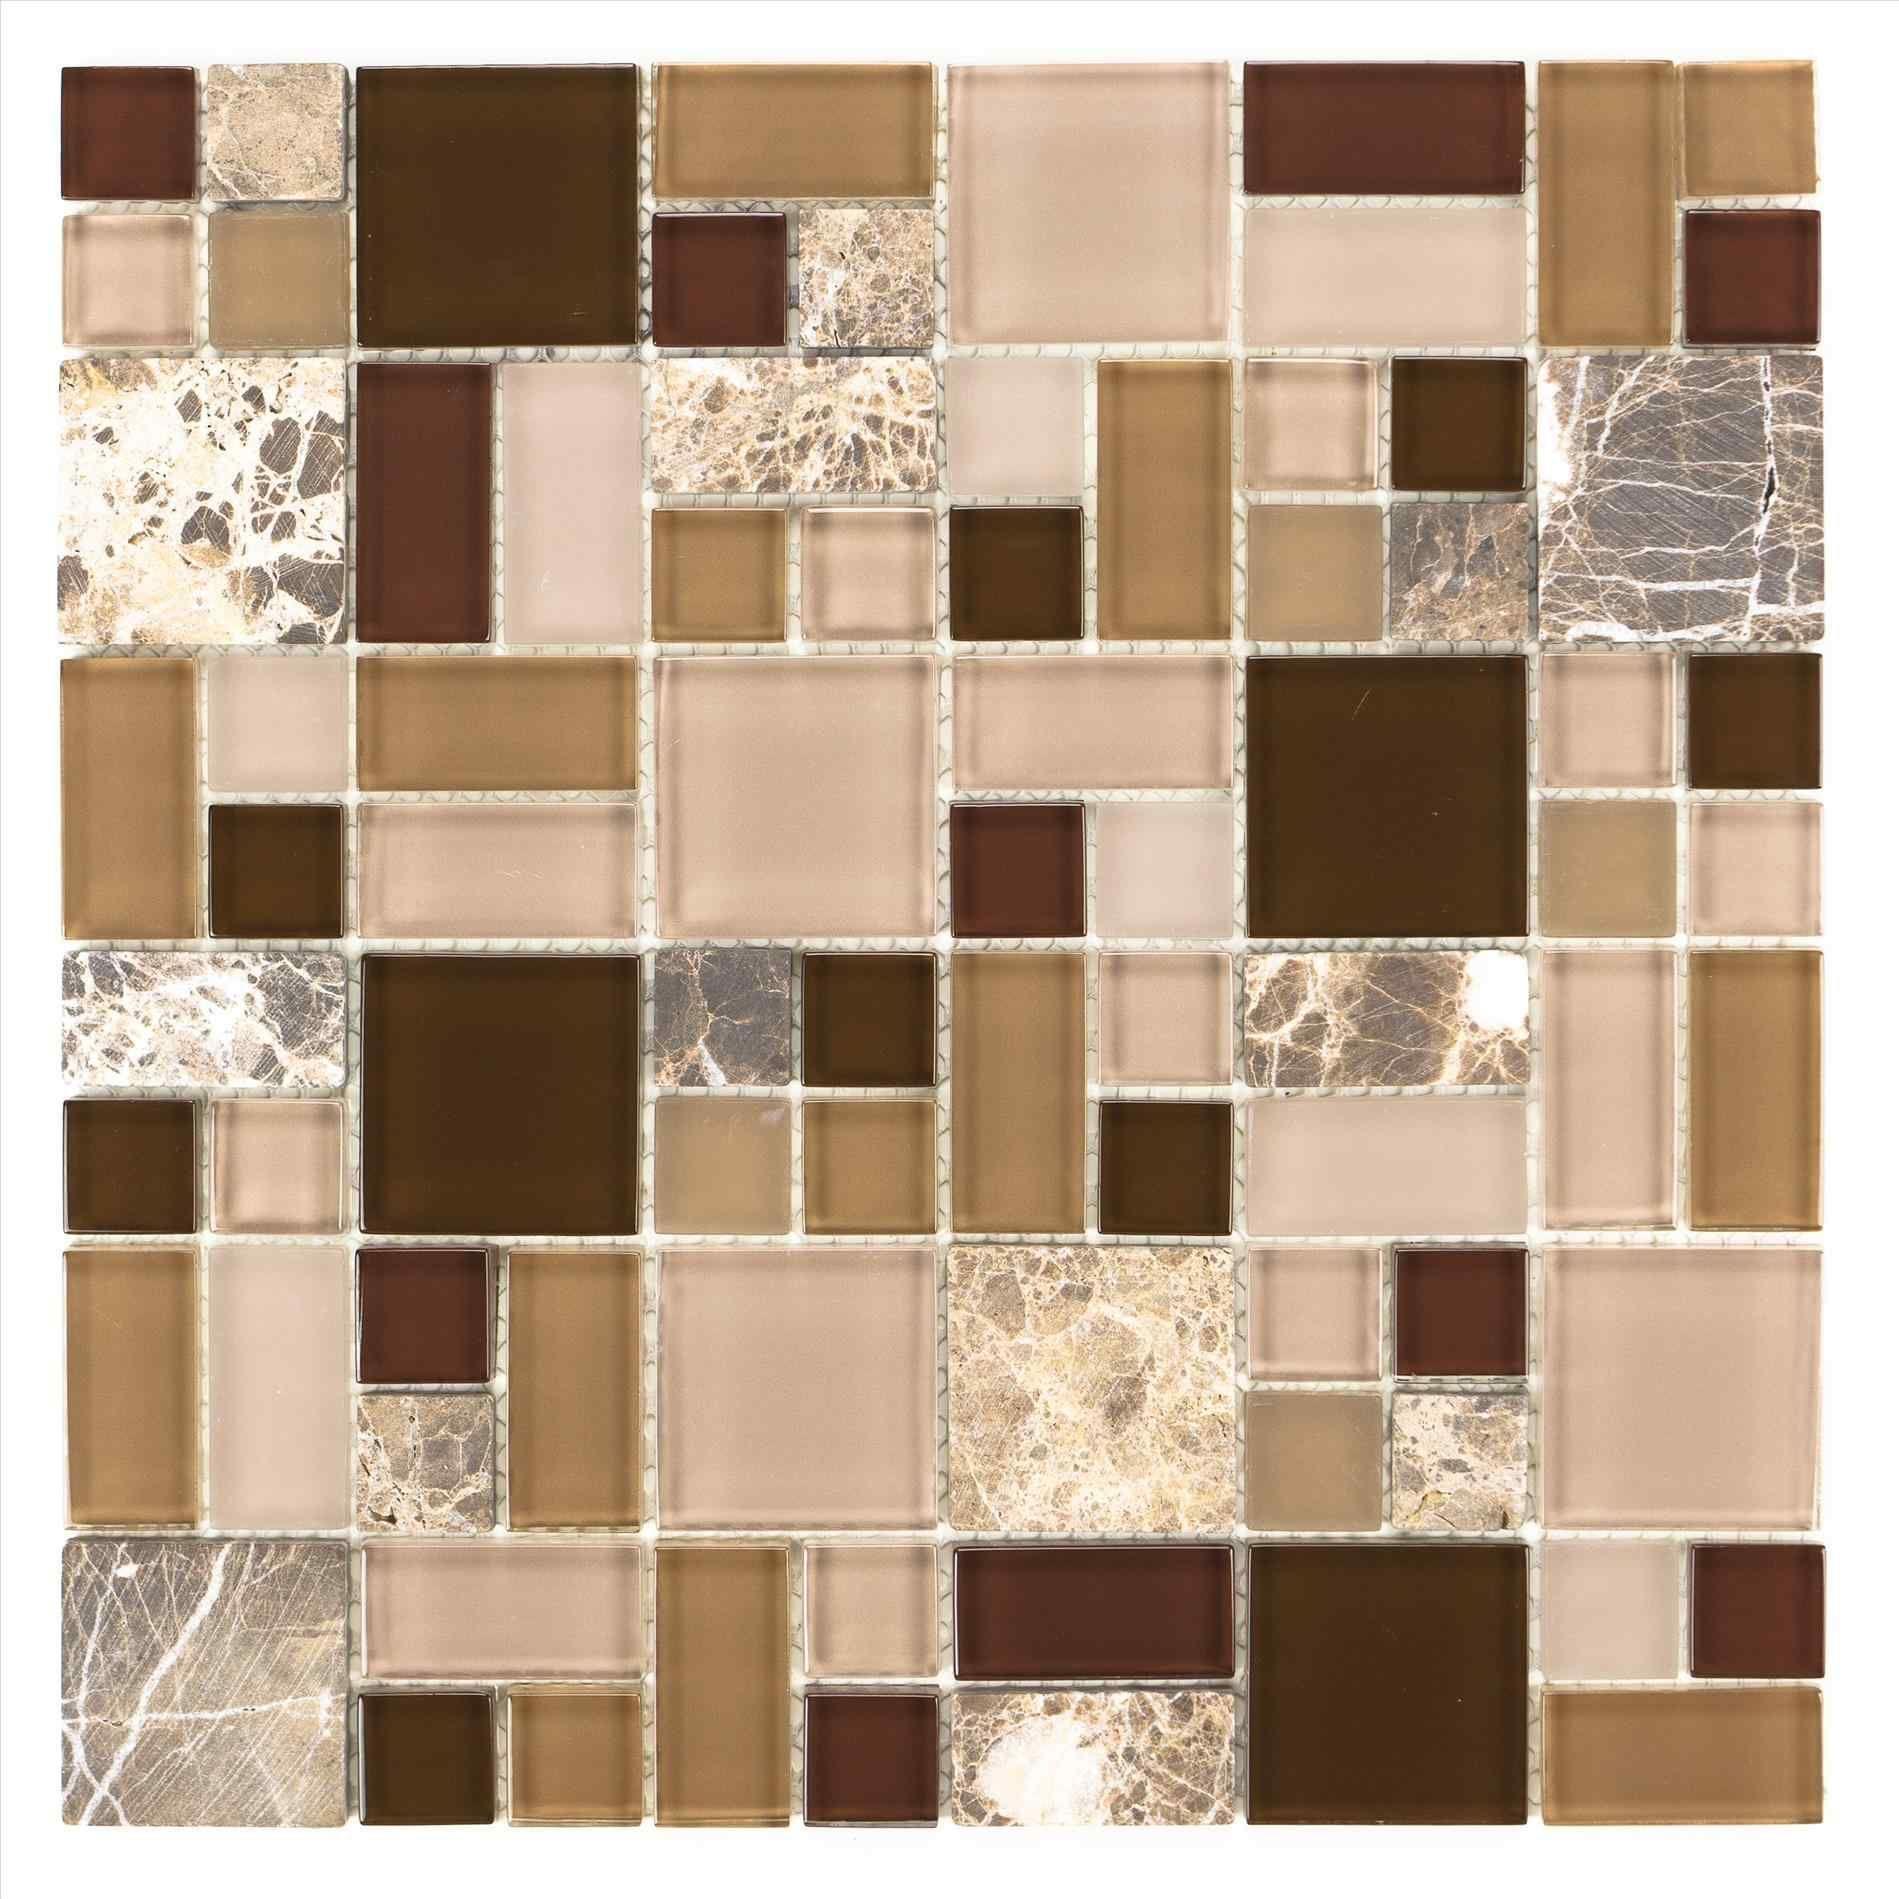 phenomenal 11 wonderful textured wall tile designs ideas on wall tile id=70498